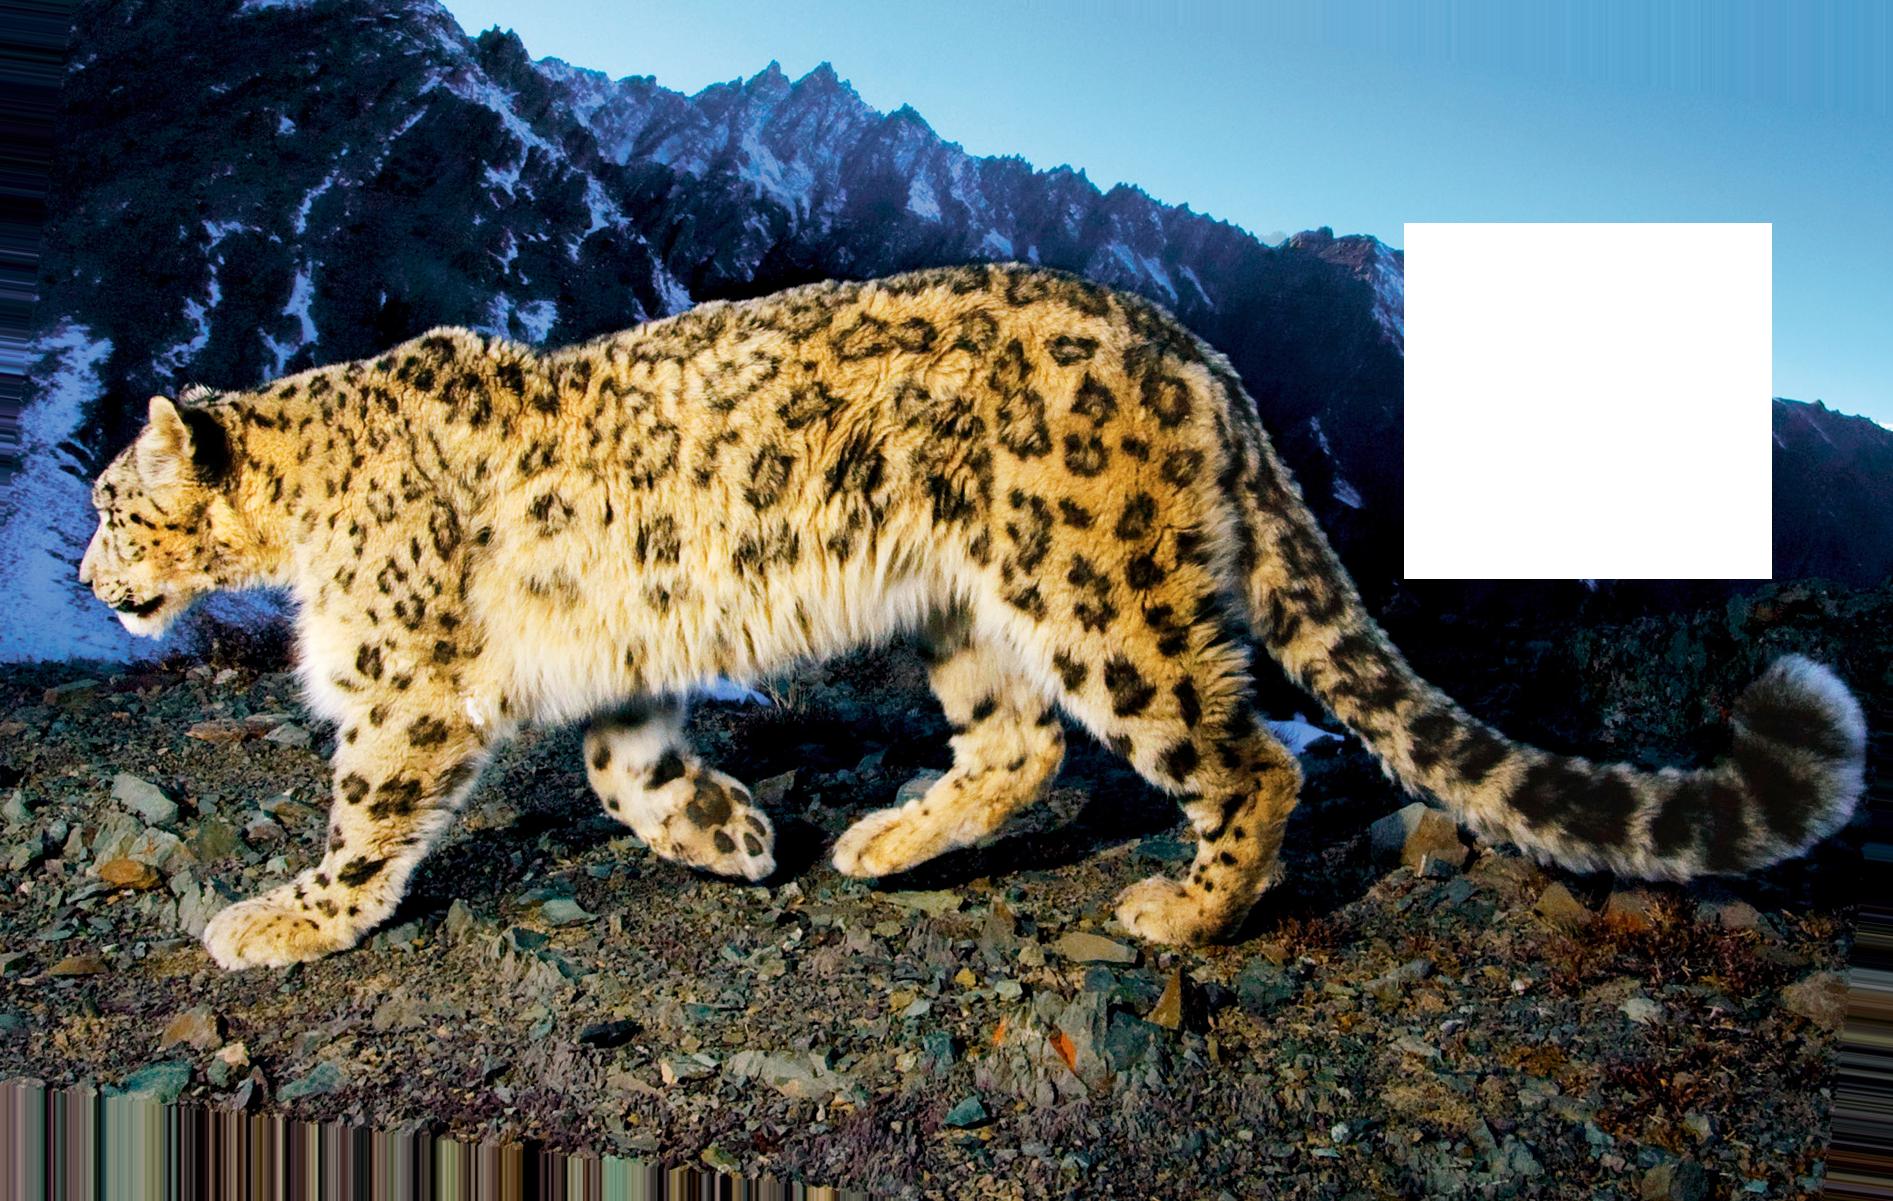 Jaguar Free Download Png PNG Image - Jaguar HD PNG